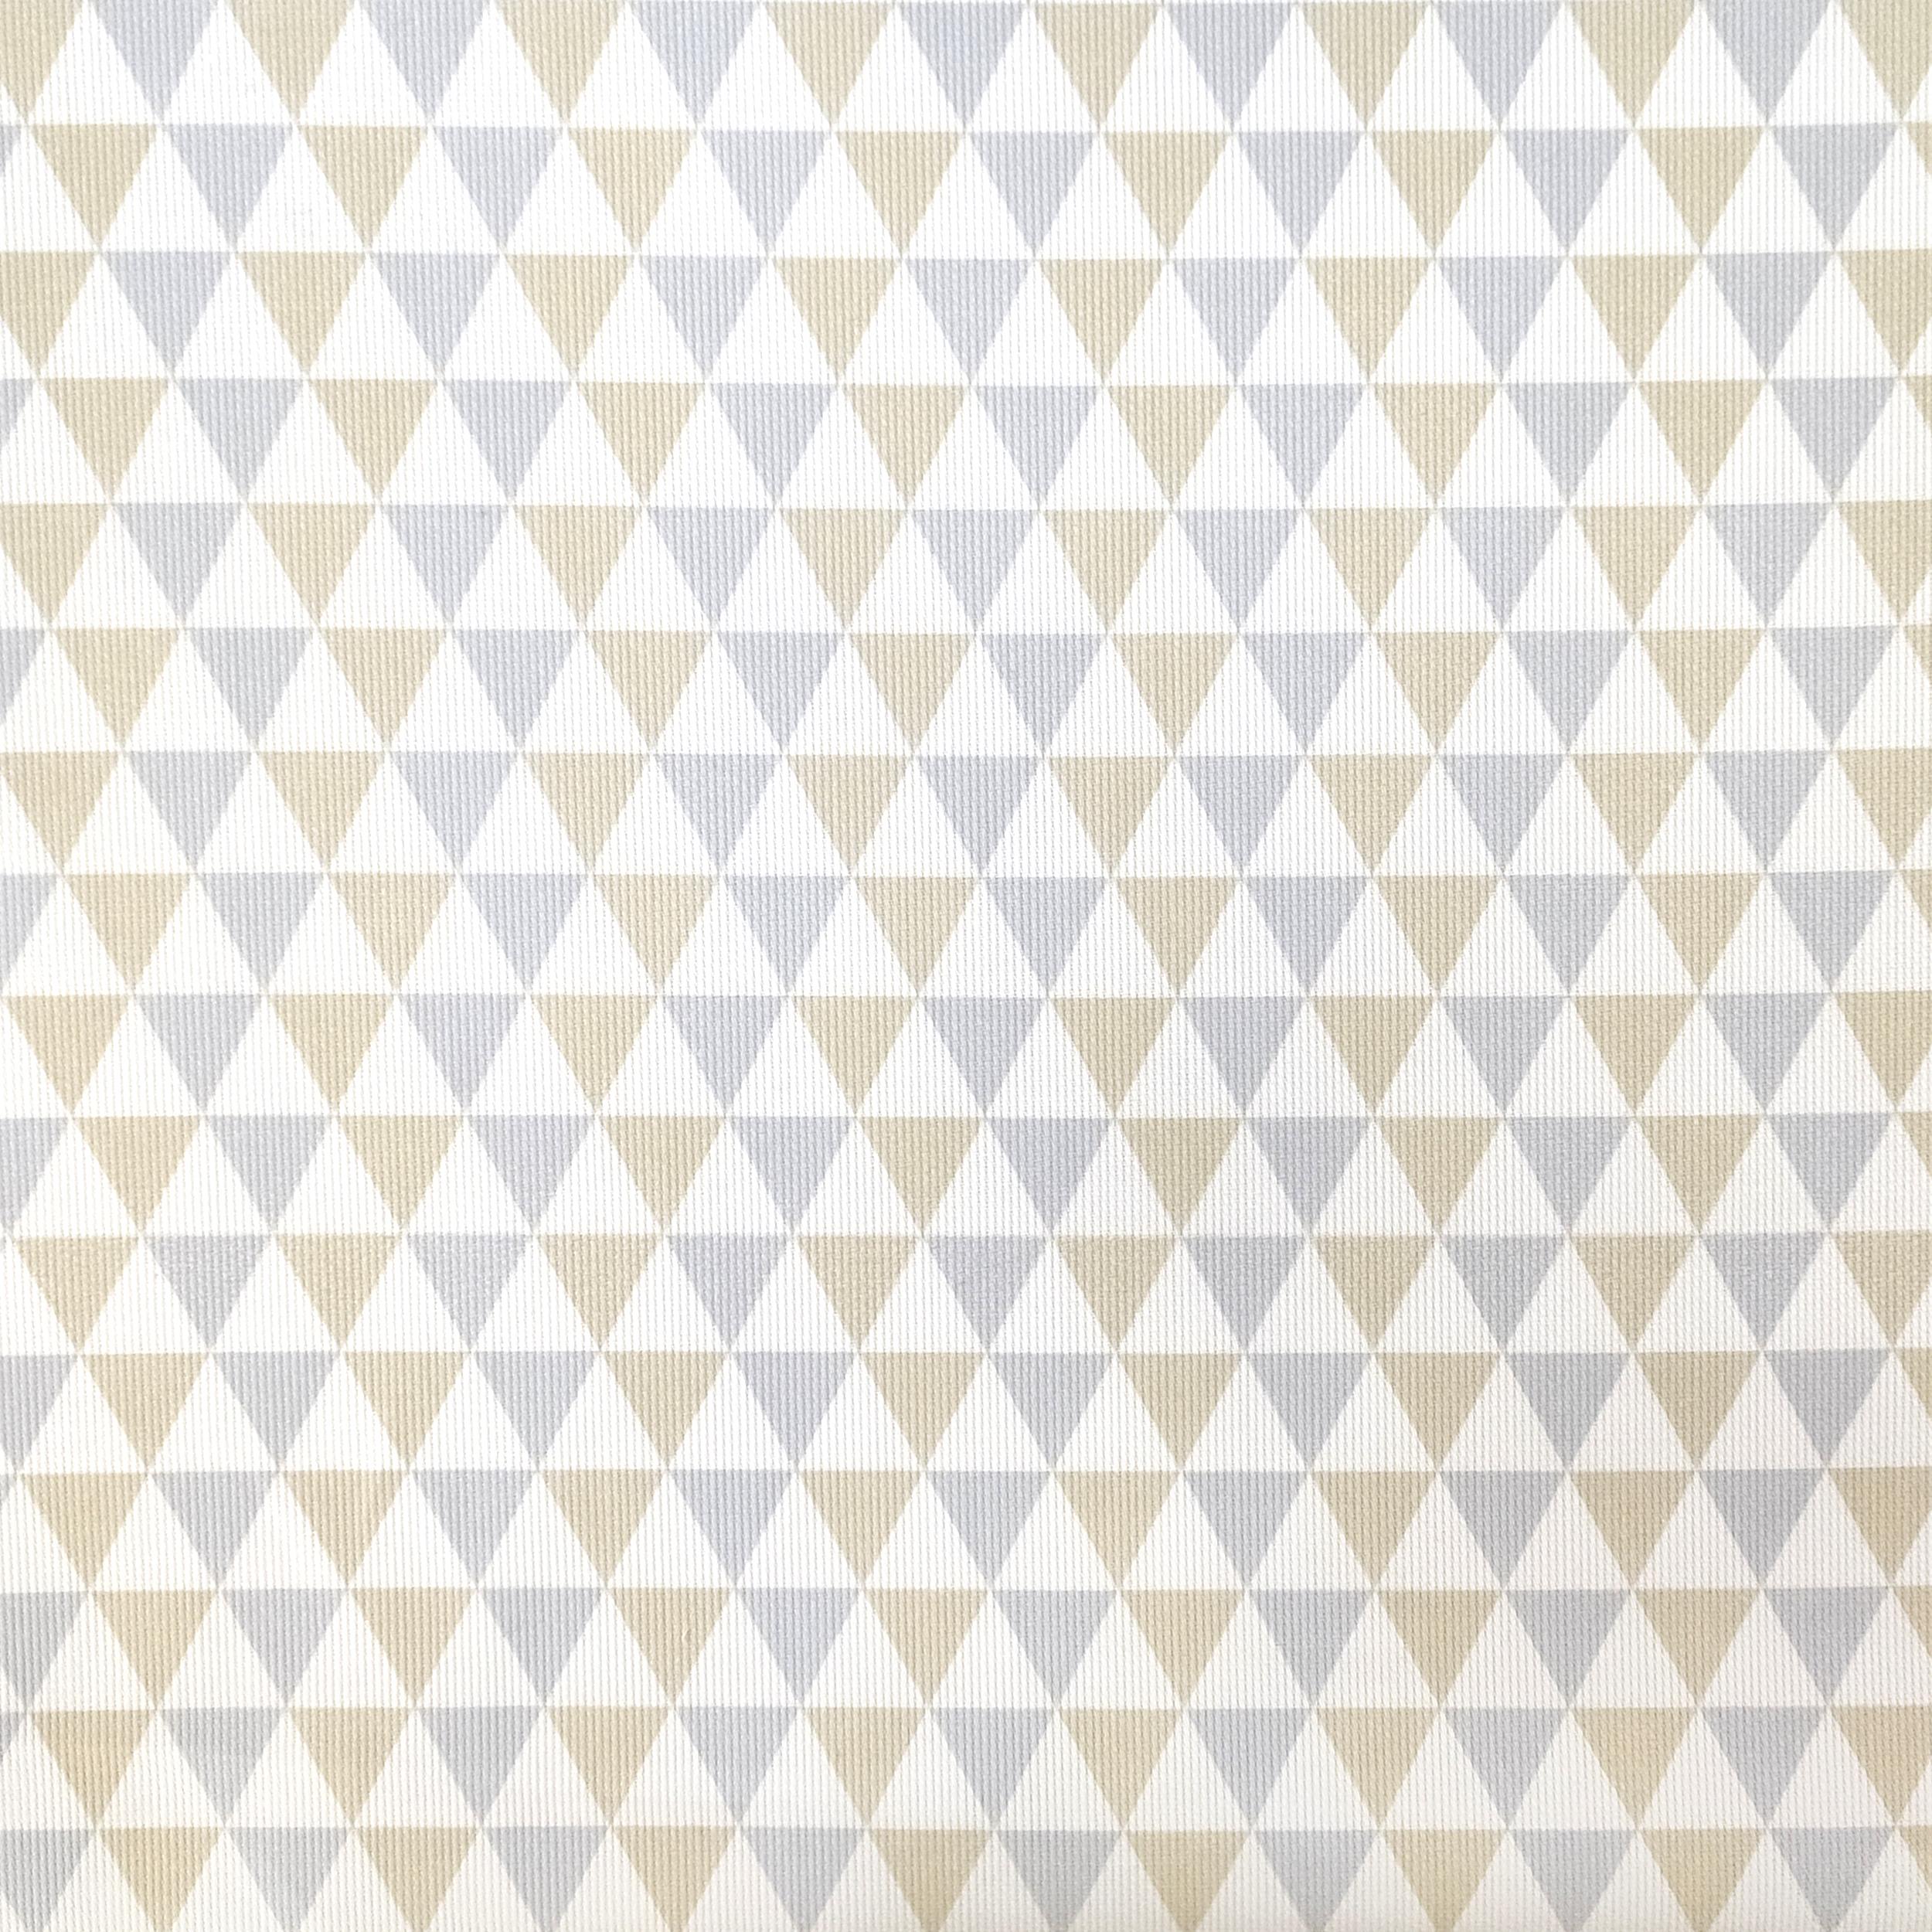 Tessuto Piquet di Cotone Fantasia Triangoli